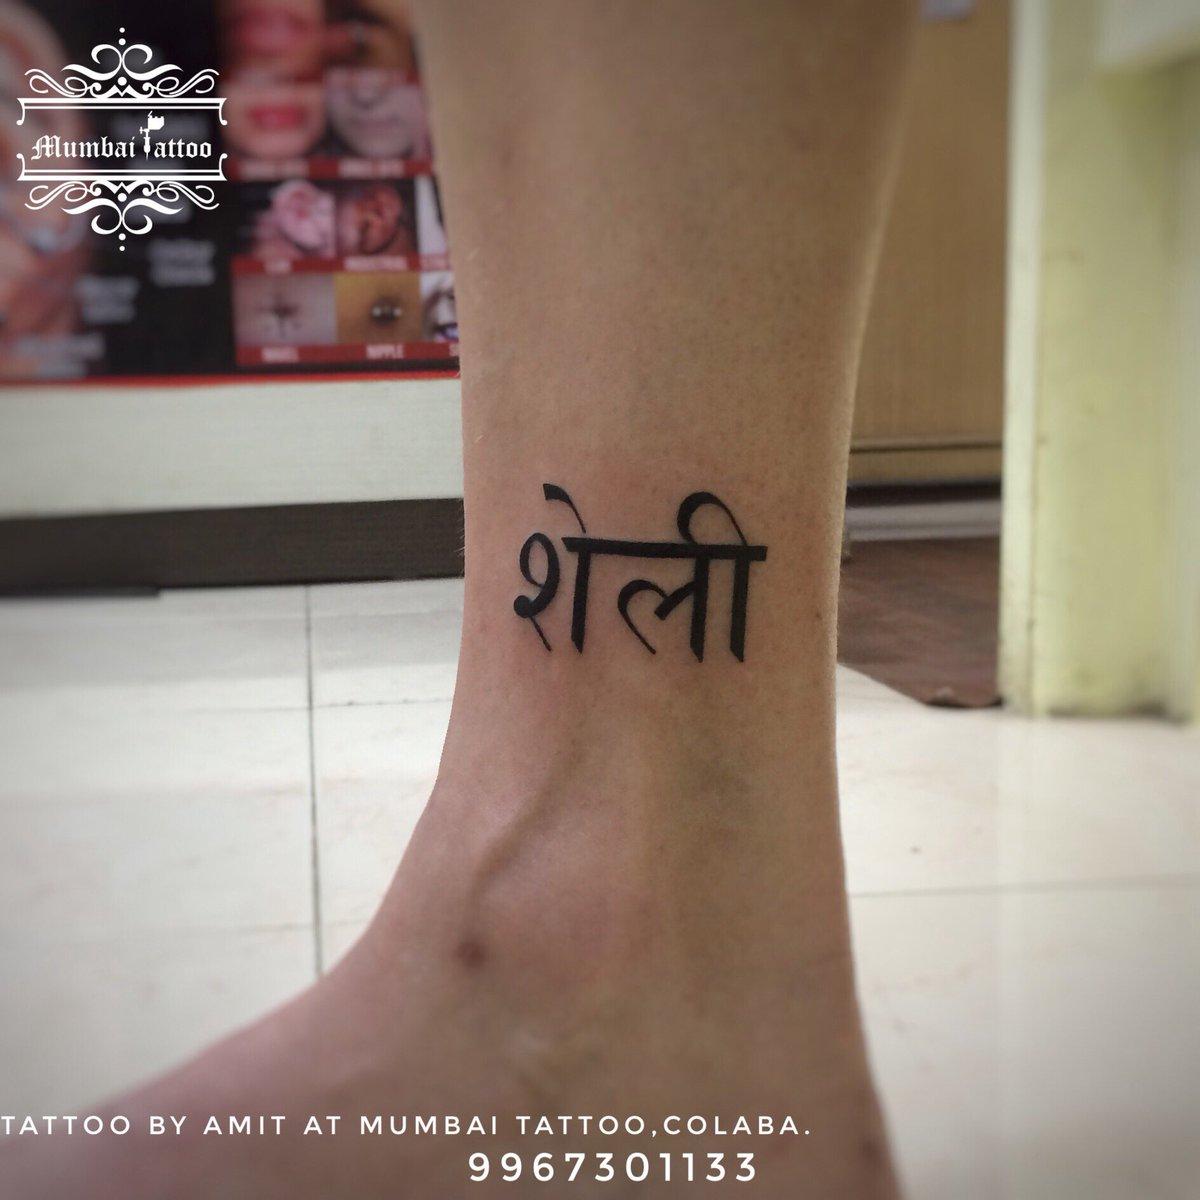 ColabaMumbai Hindi calligraphy name tattoo